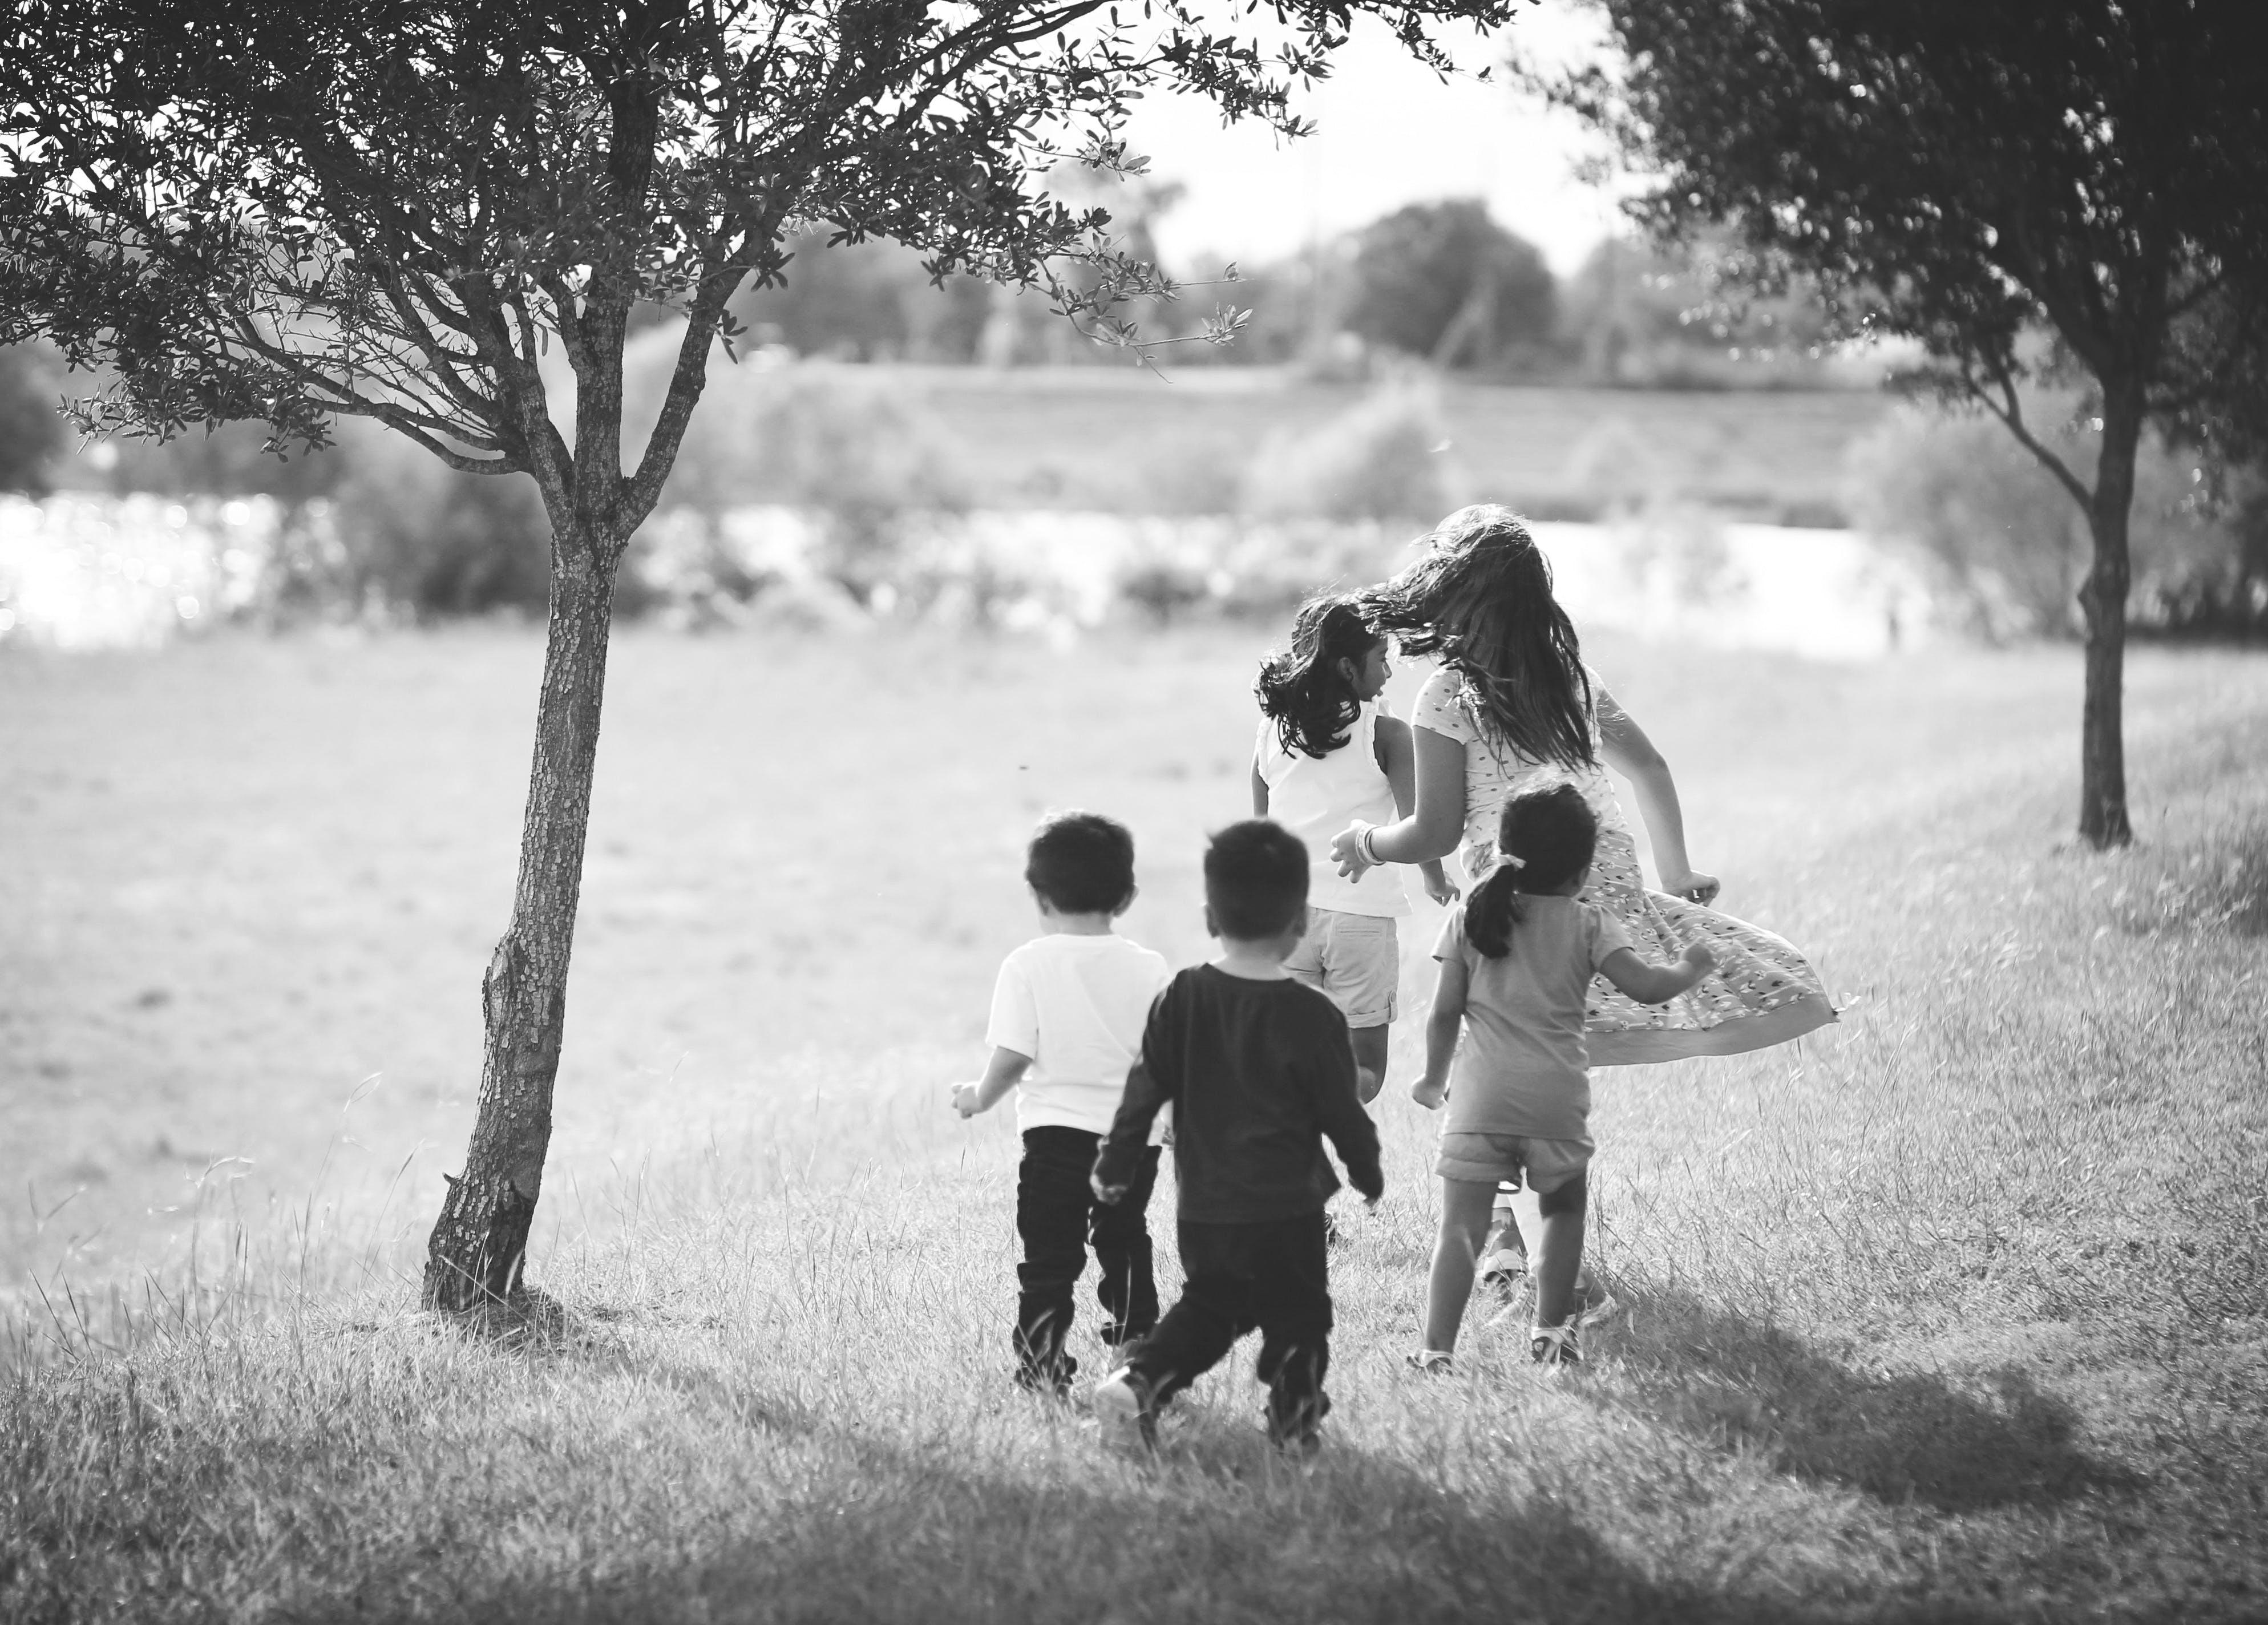 Grayscale Photo of Five Children Near Tree